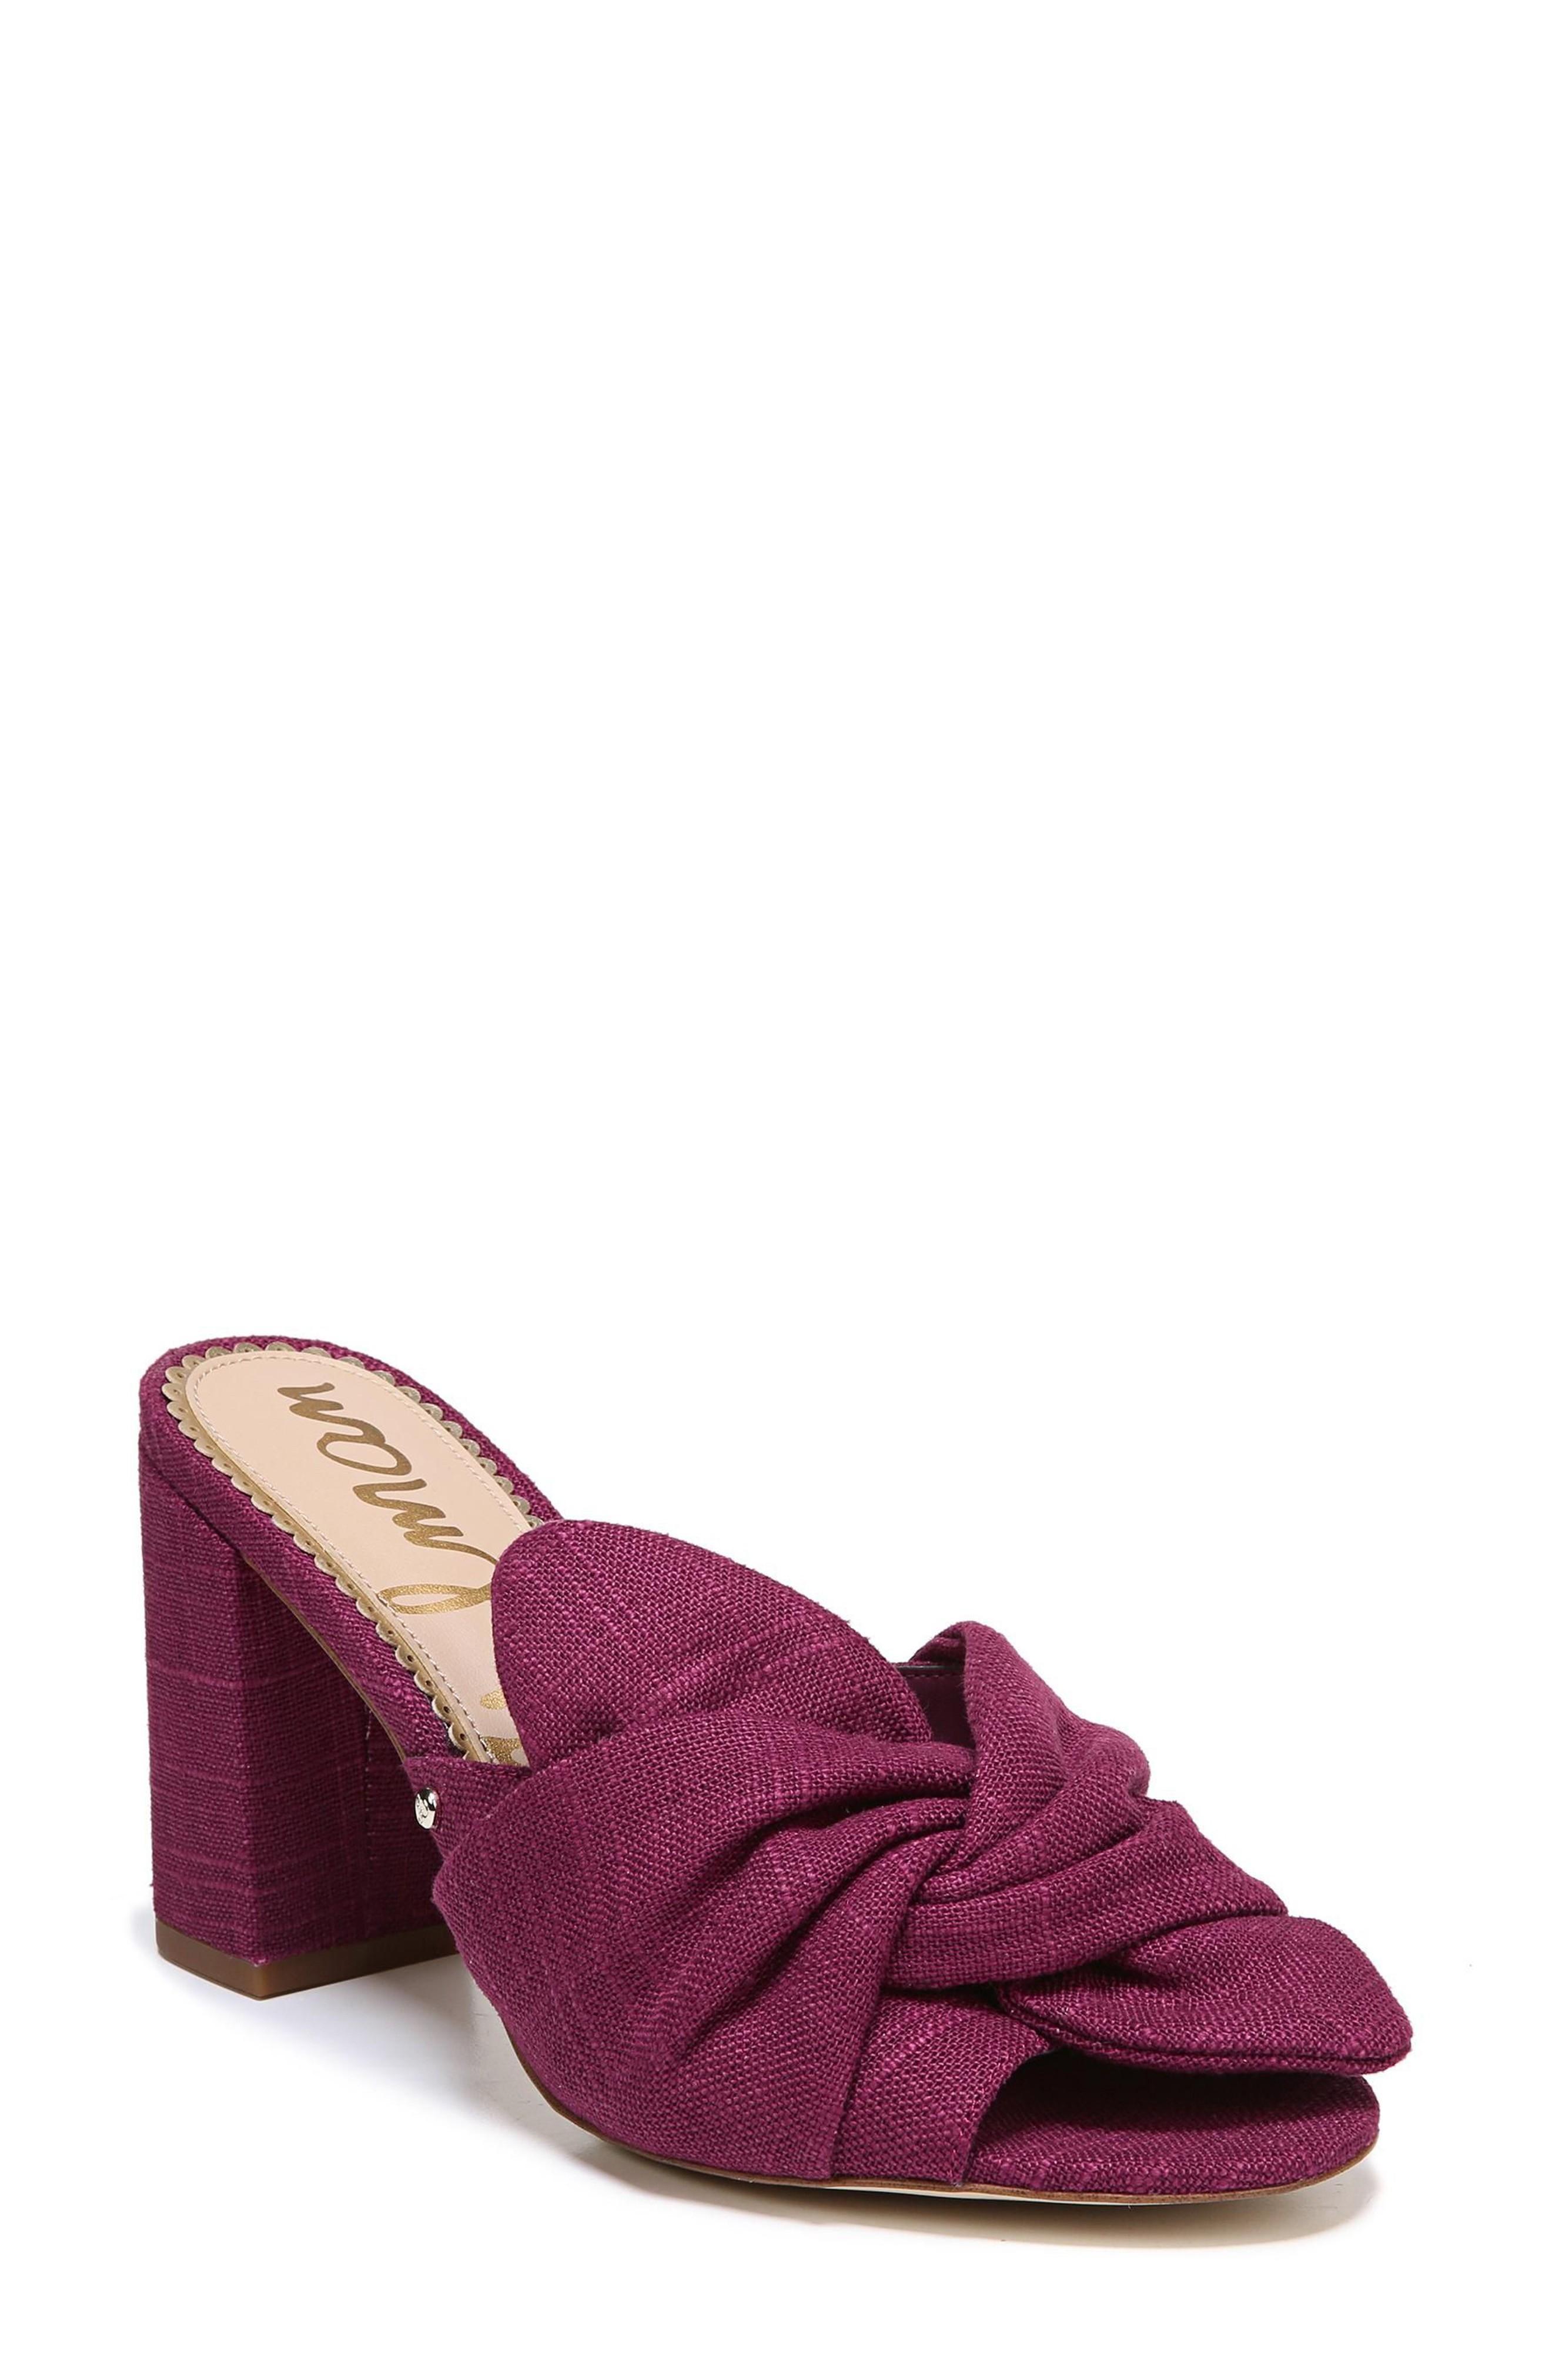 780330ce36a Sam Edelman Oda Slide Sandal In Mulberry Pink